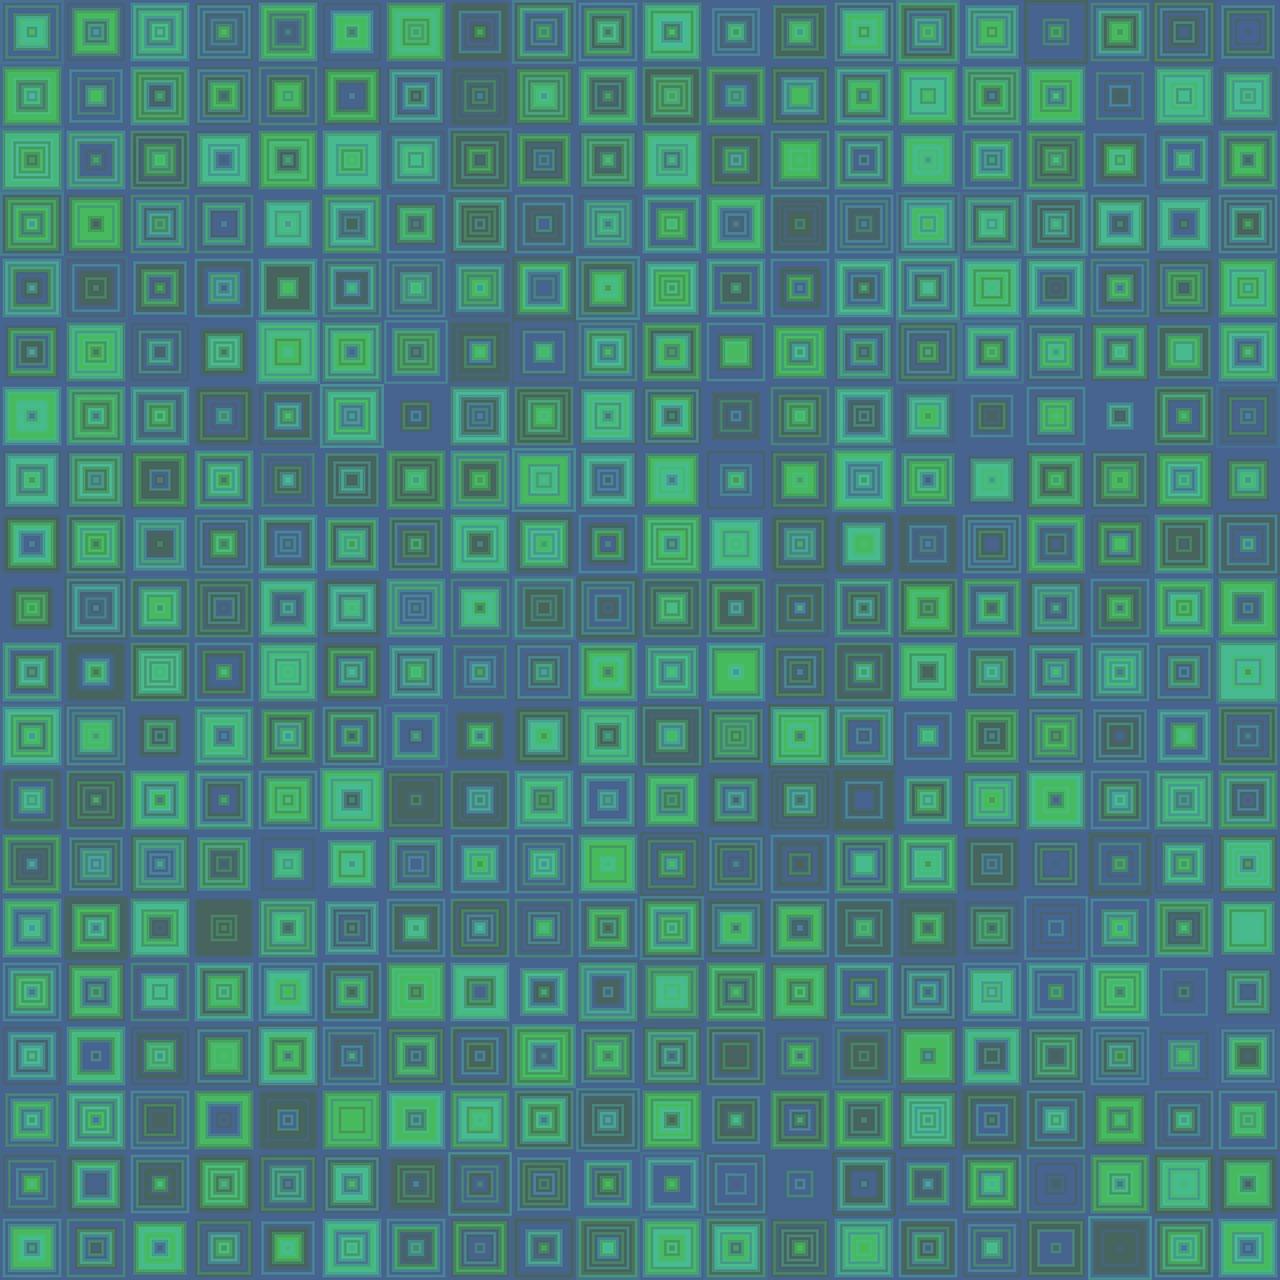 Background,tile,square,mosaic,design - free photo from needpix.com